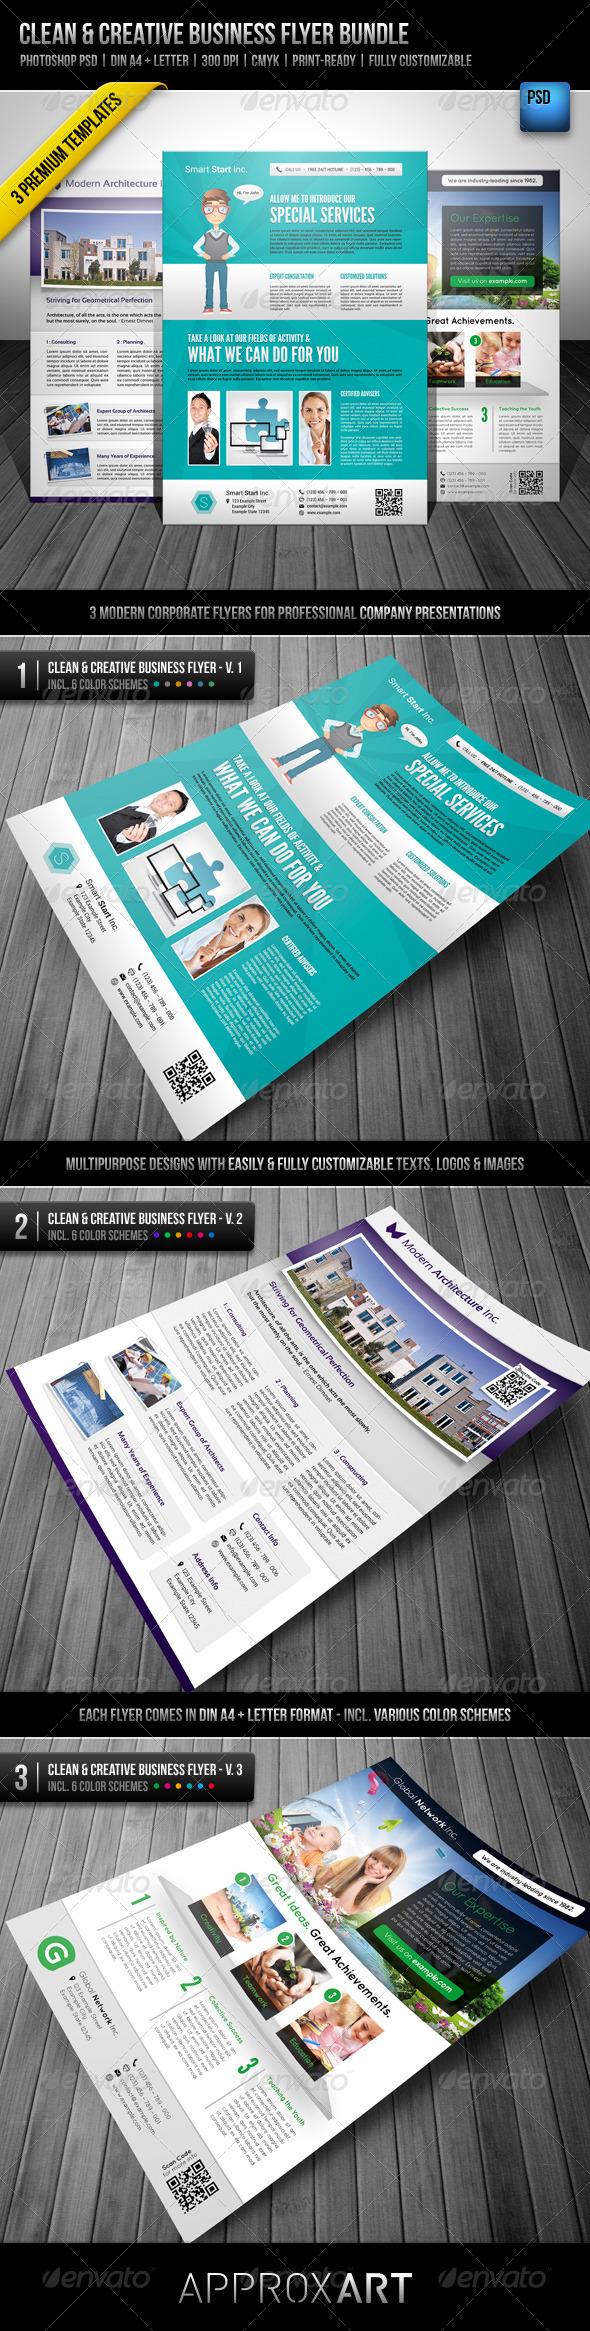 GraphicRiver Clean & Creative Business Flyer Bundle 3033011